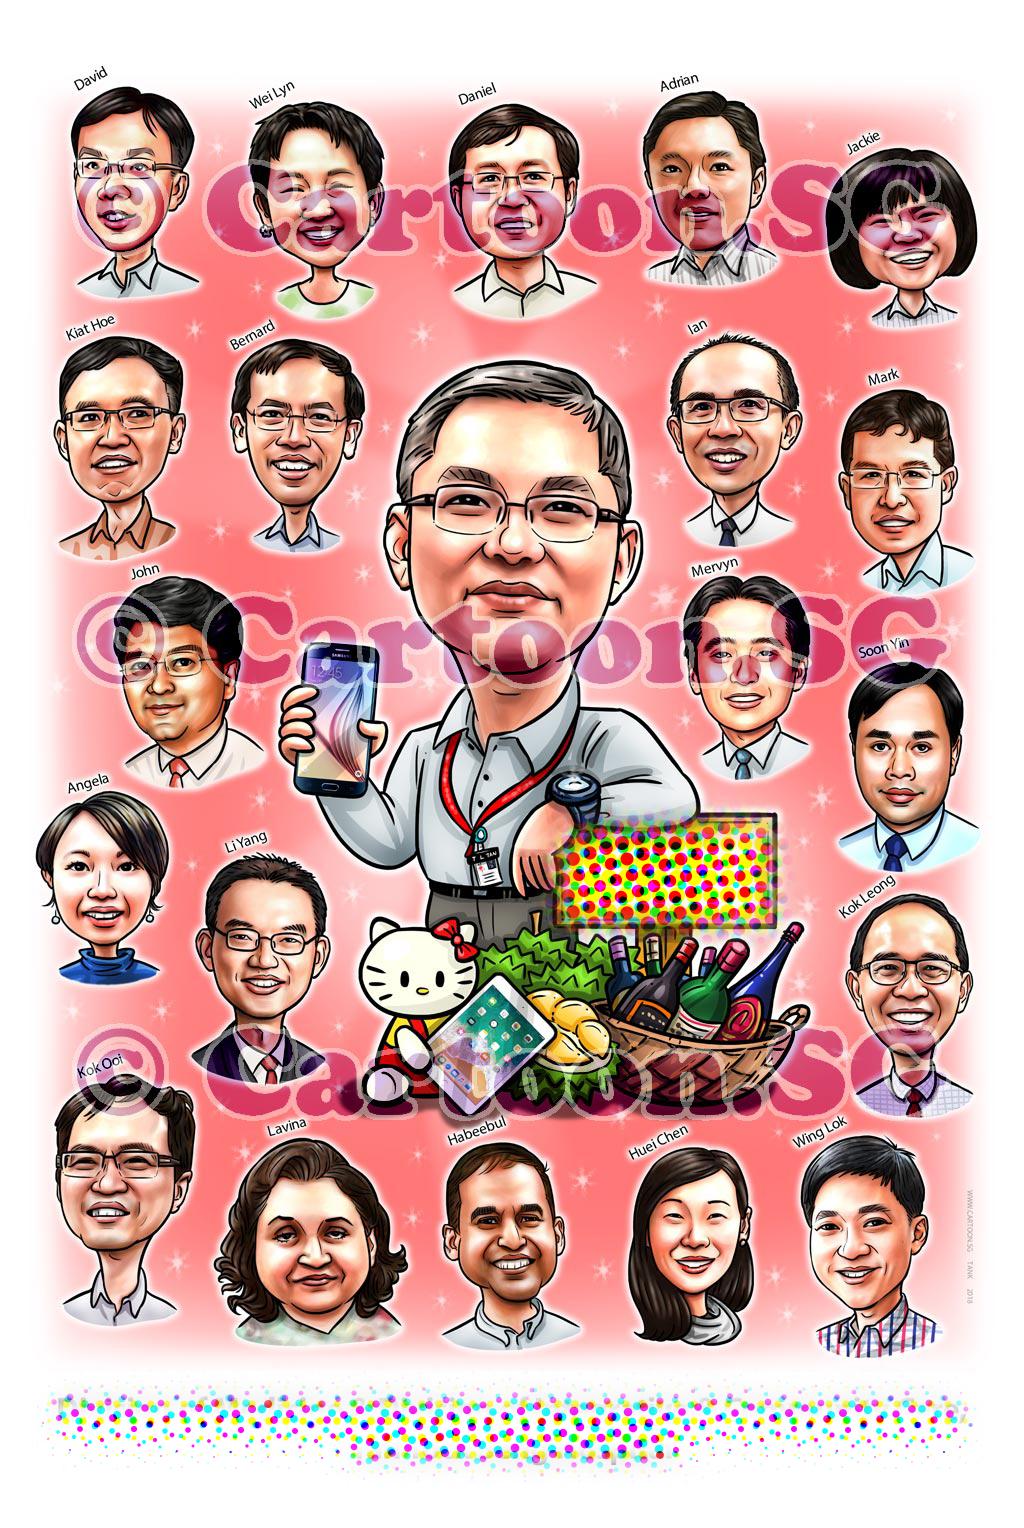 20180314-Caricature-Singapore-digital-boss-farewell-TTS-hospital-group-.jpg